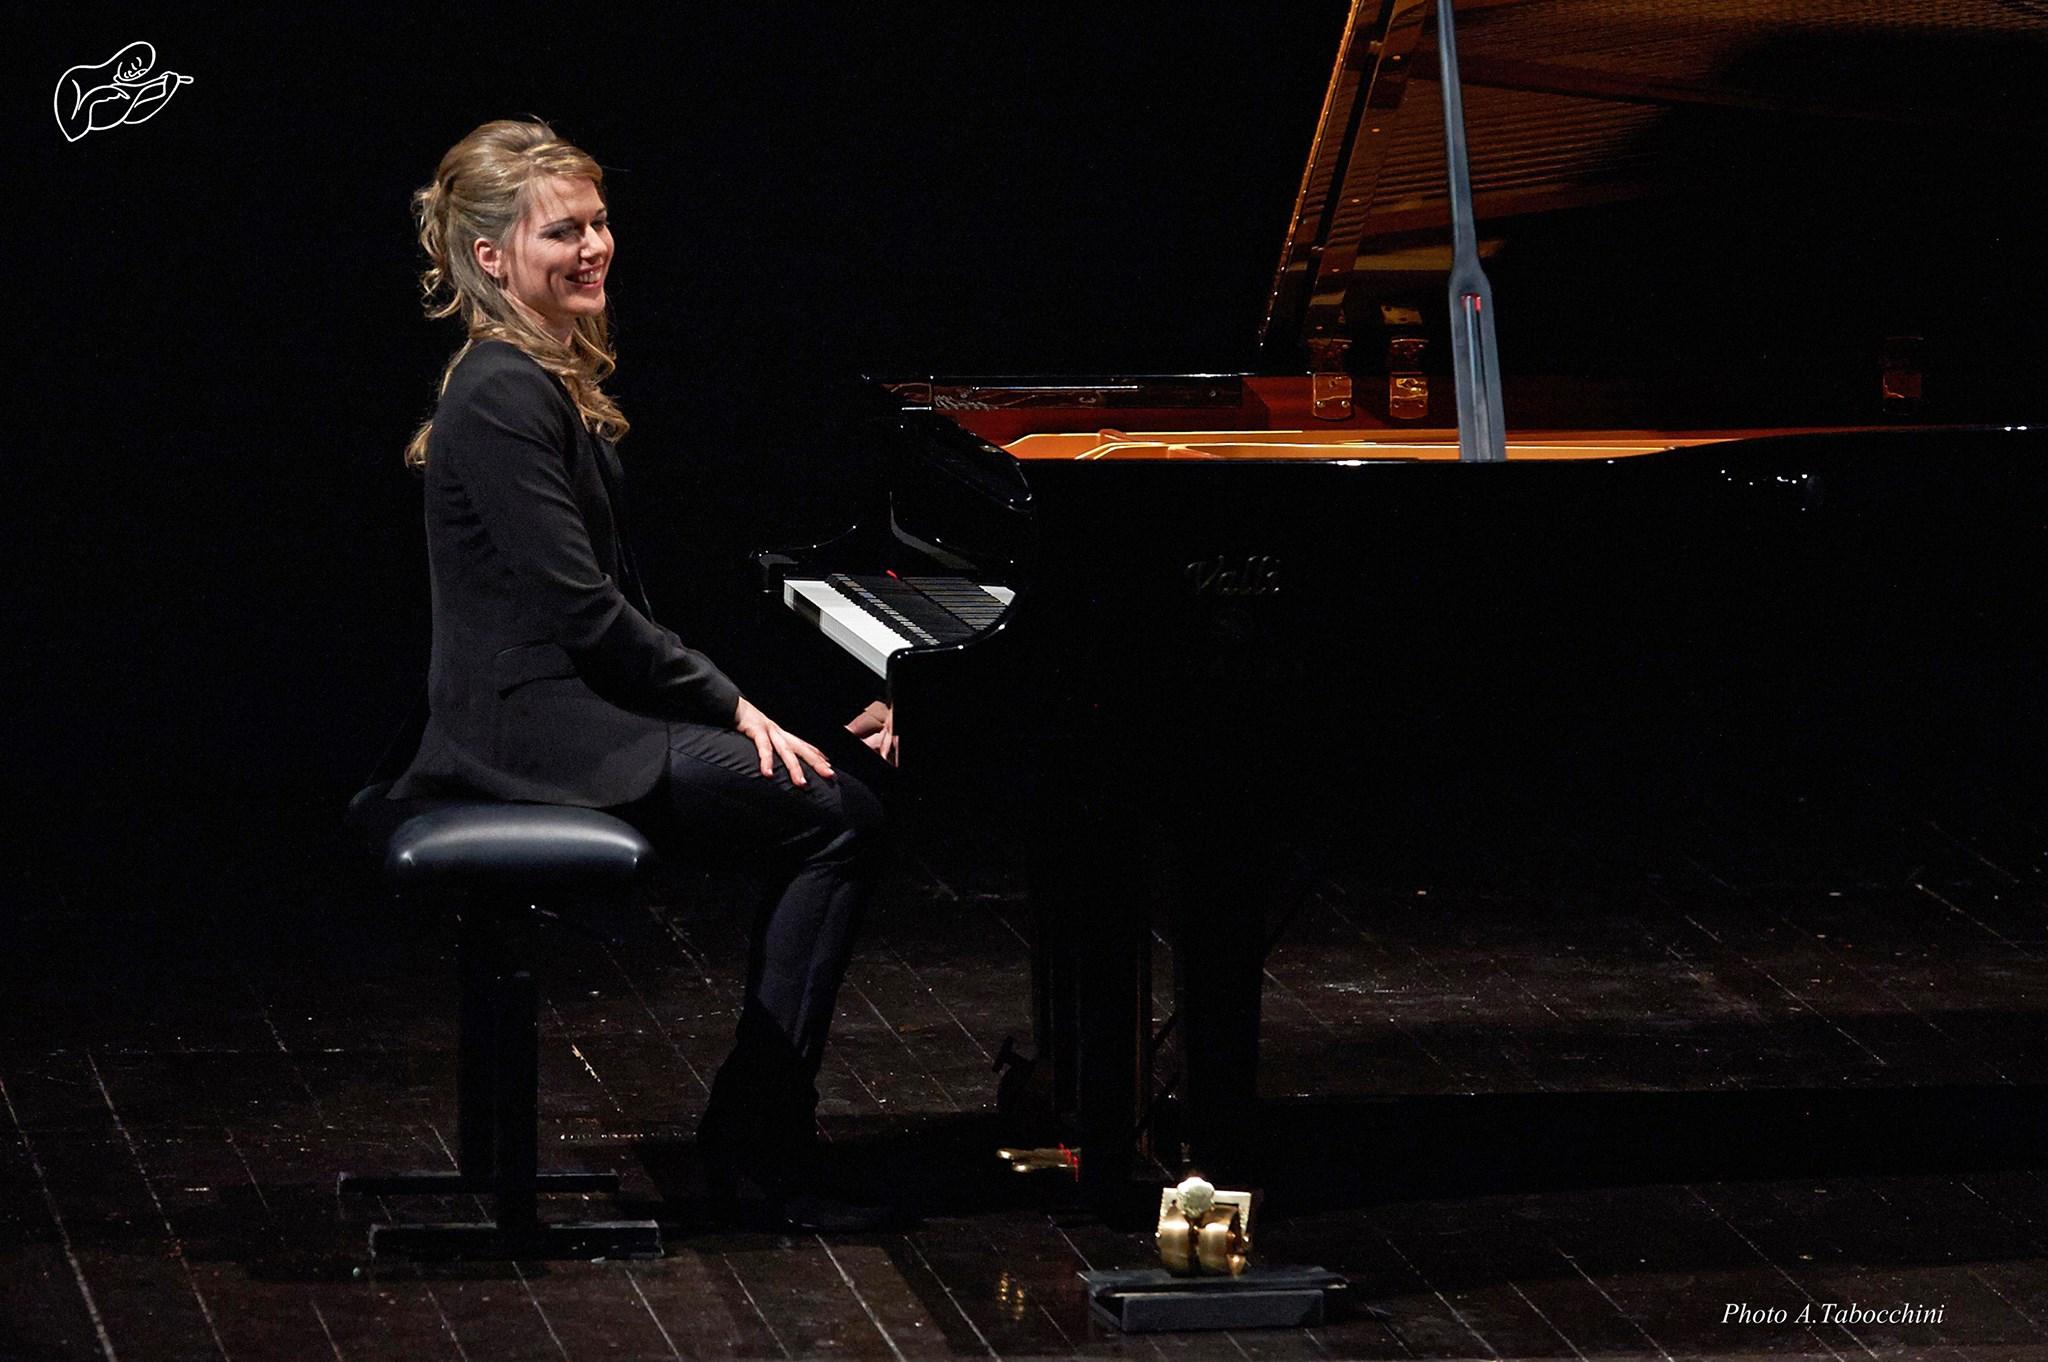 Macerata, romanticismo con la pianista Ottavia Maria Maceratini